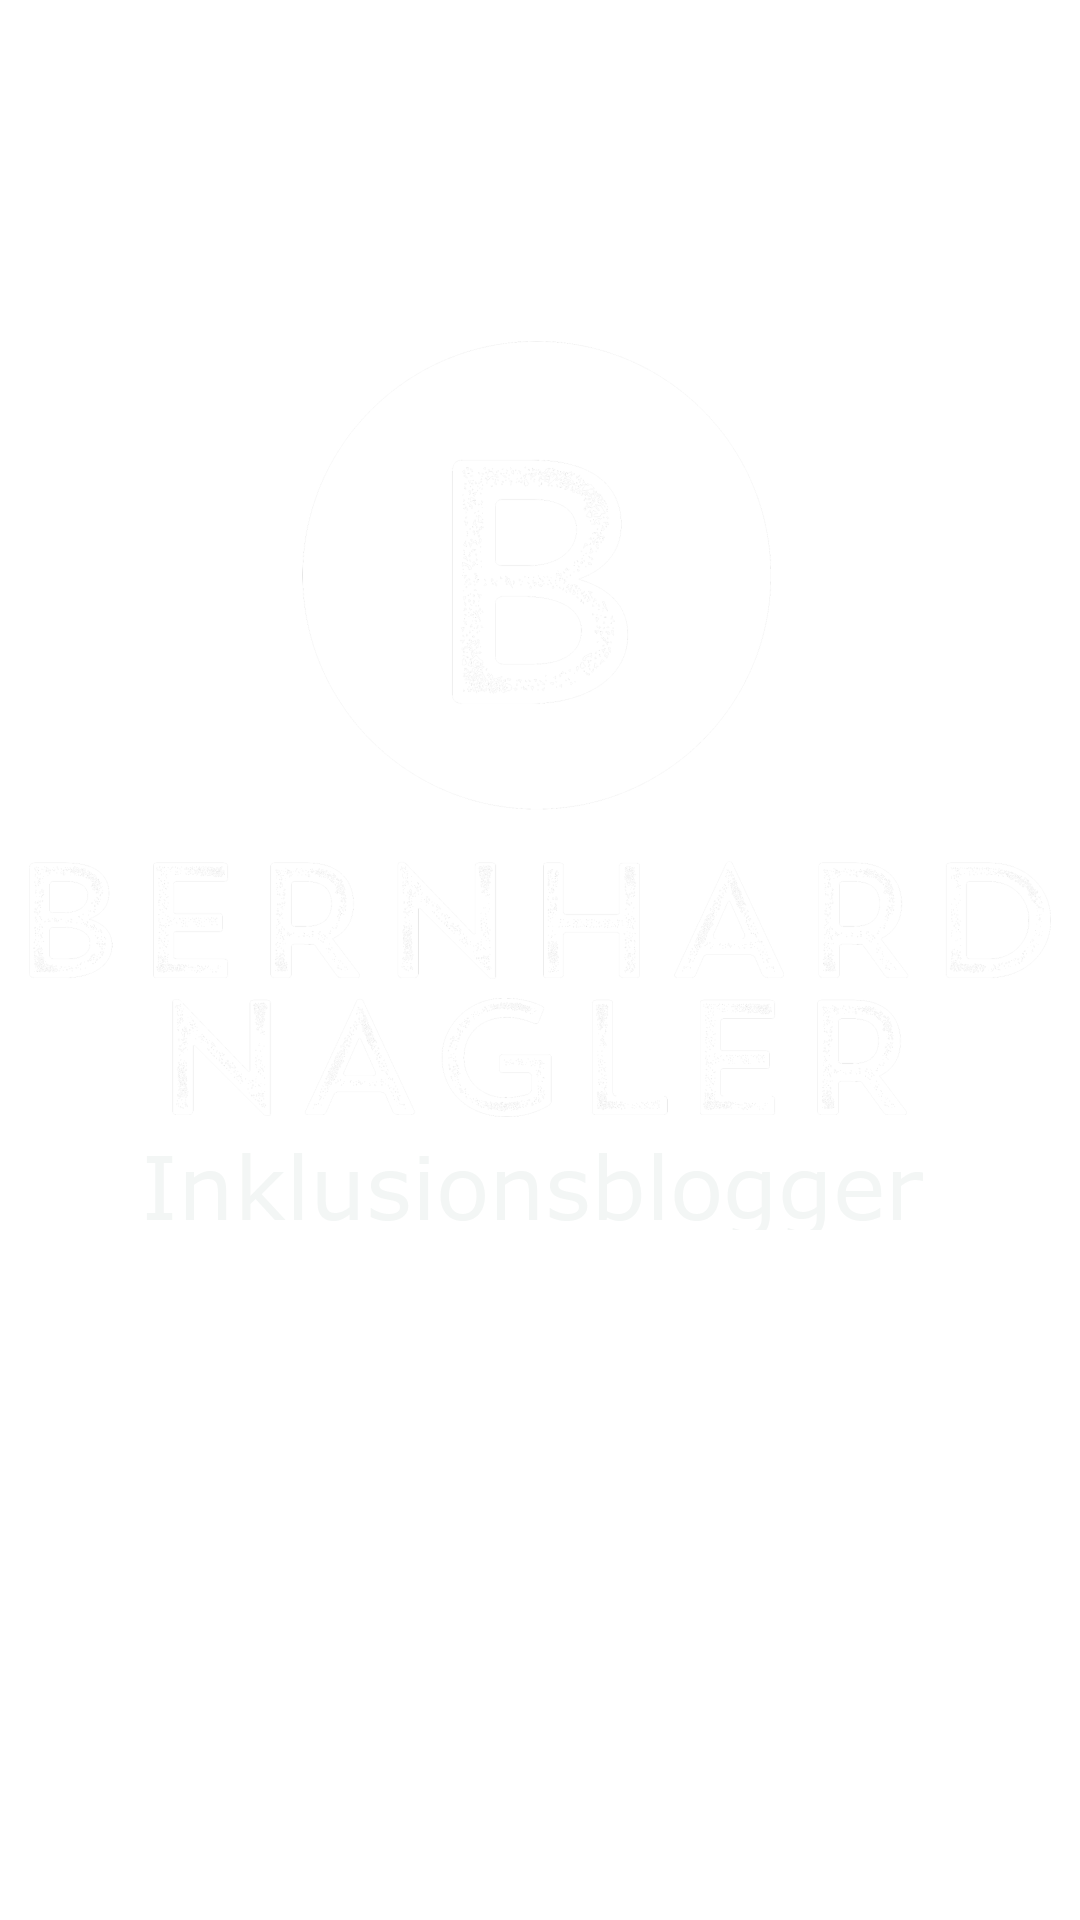 Inklusionsblogger logo